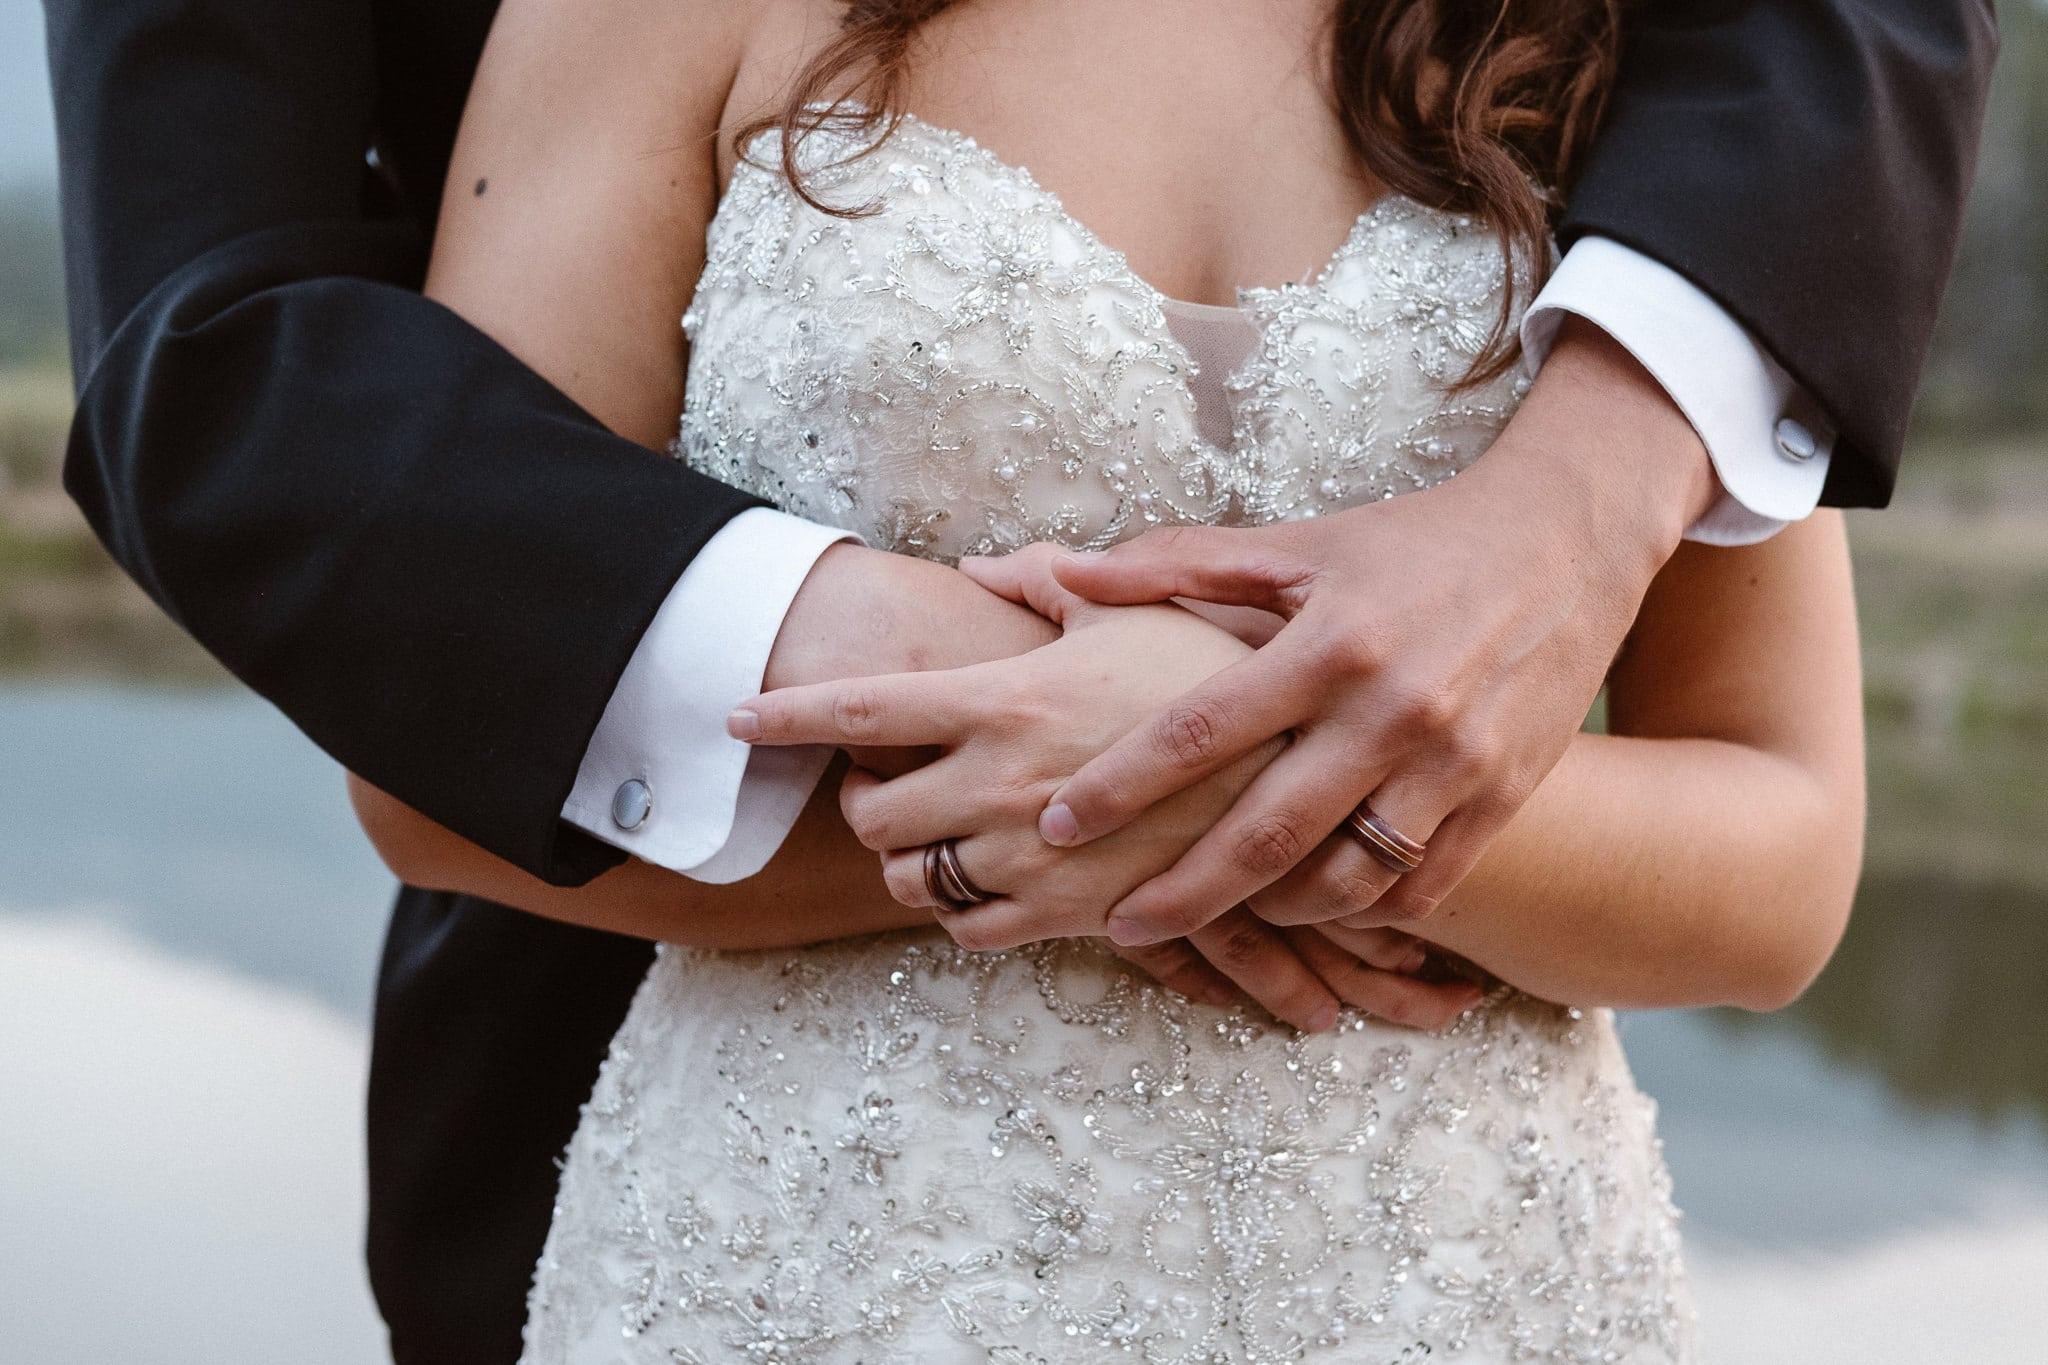 Dao House wedding photographer, Estes Park wedding venue, Colorado mountain wedding, bride and groom arms wrapped, wedding portraits